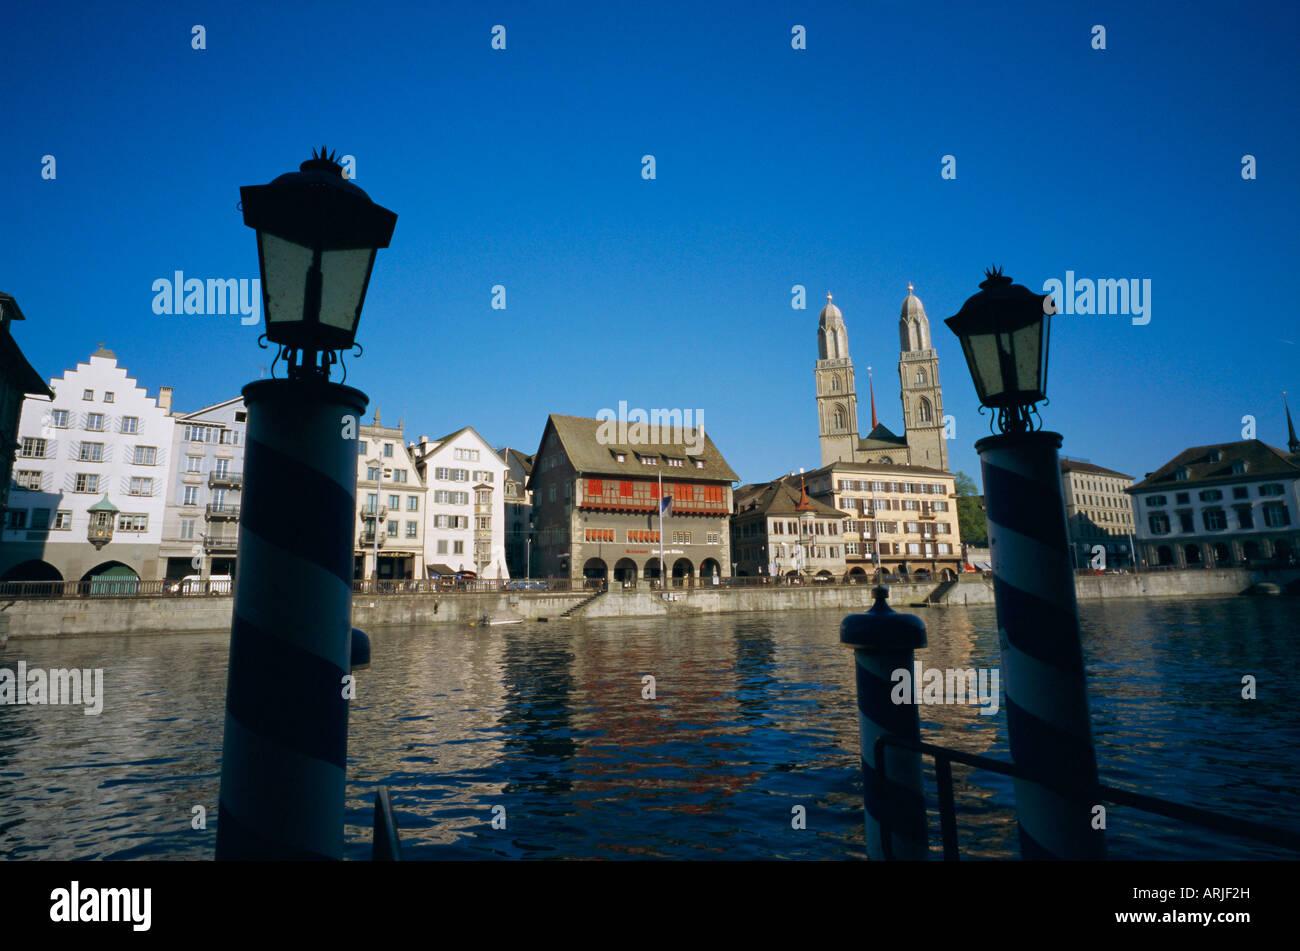 View across Limmat River to Limmatquai from Schipfe, Zurich, Switzerland, Europe - Stock Image